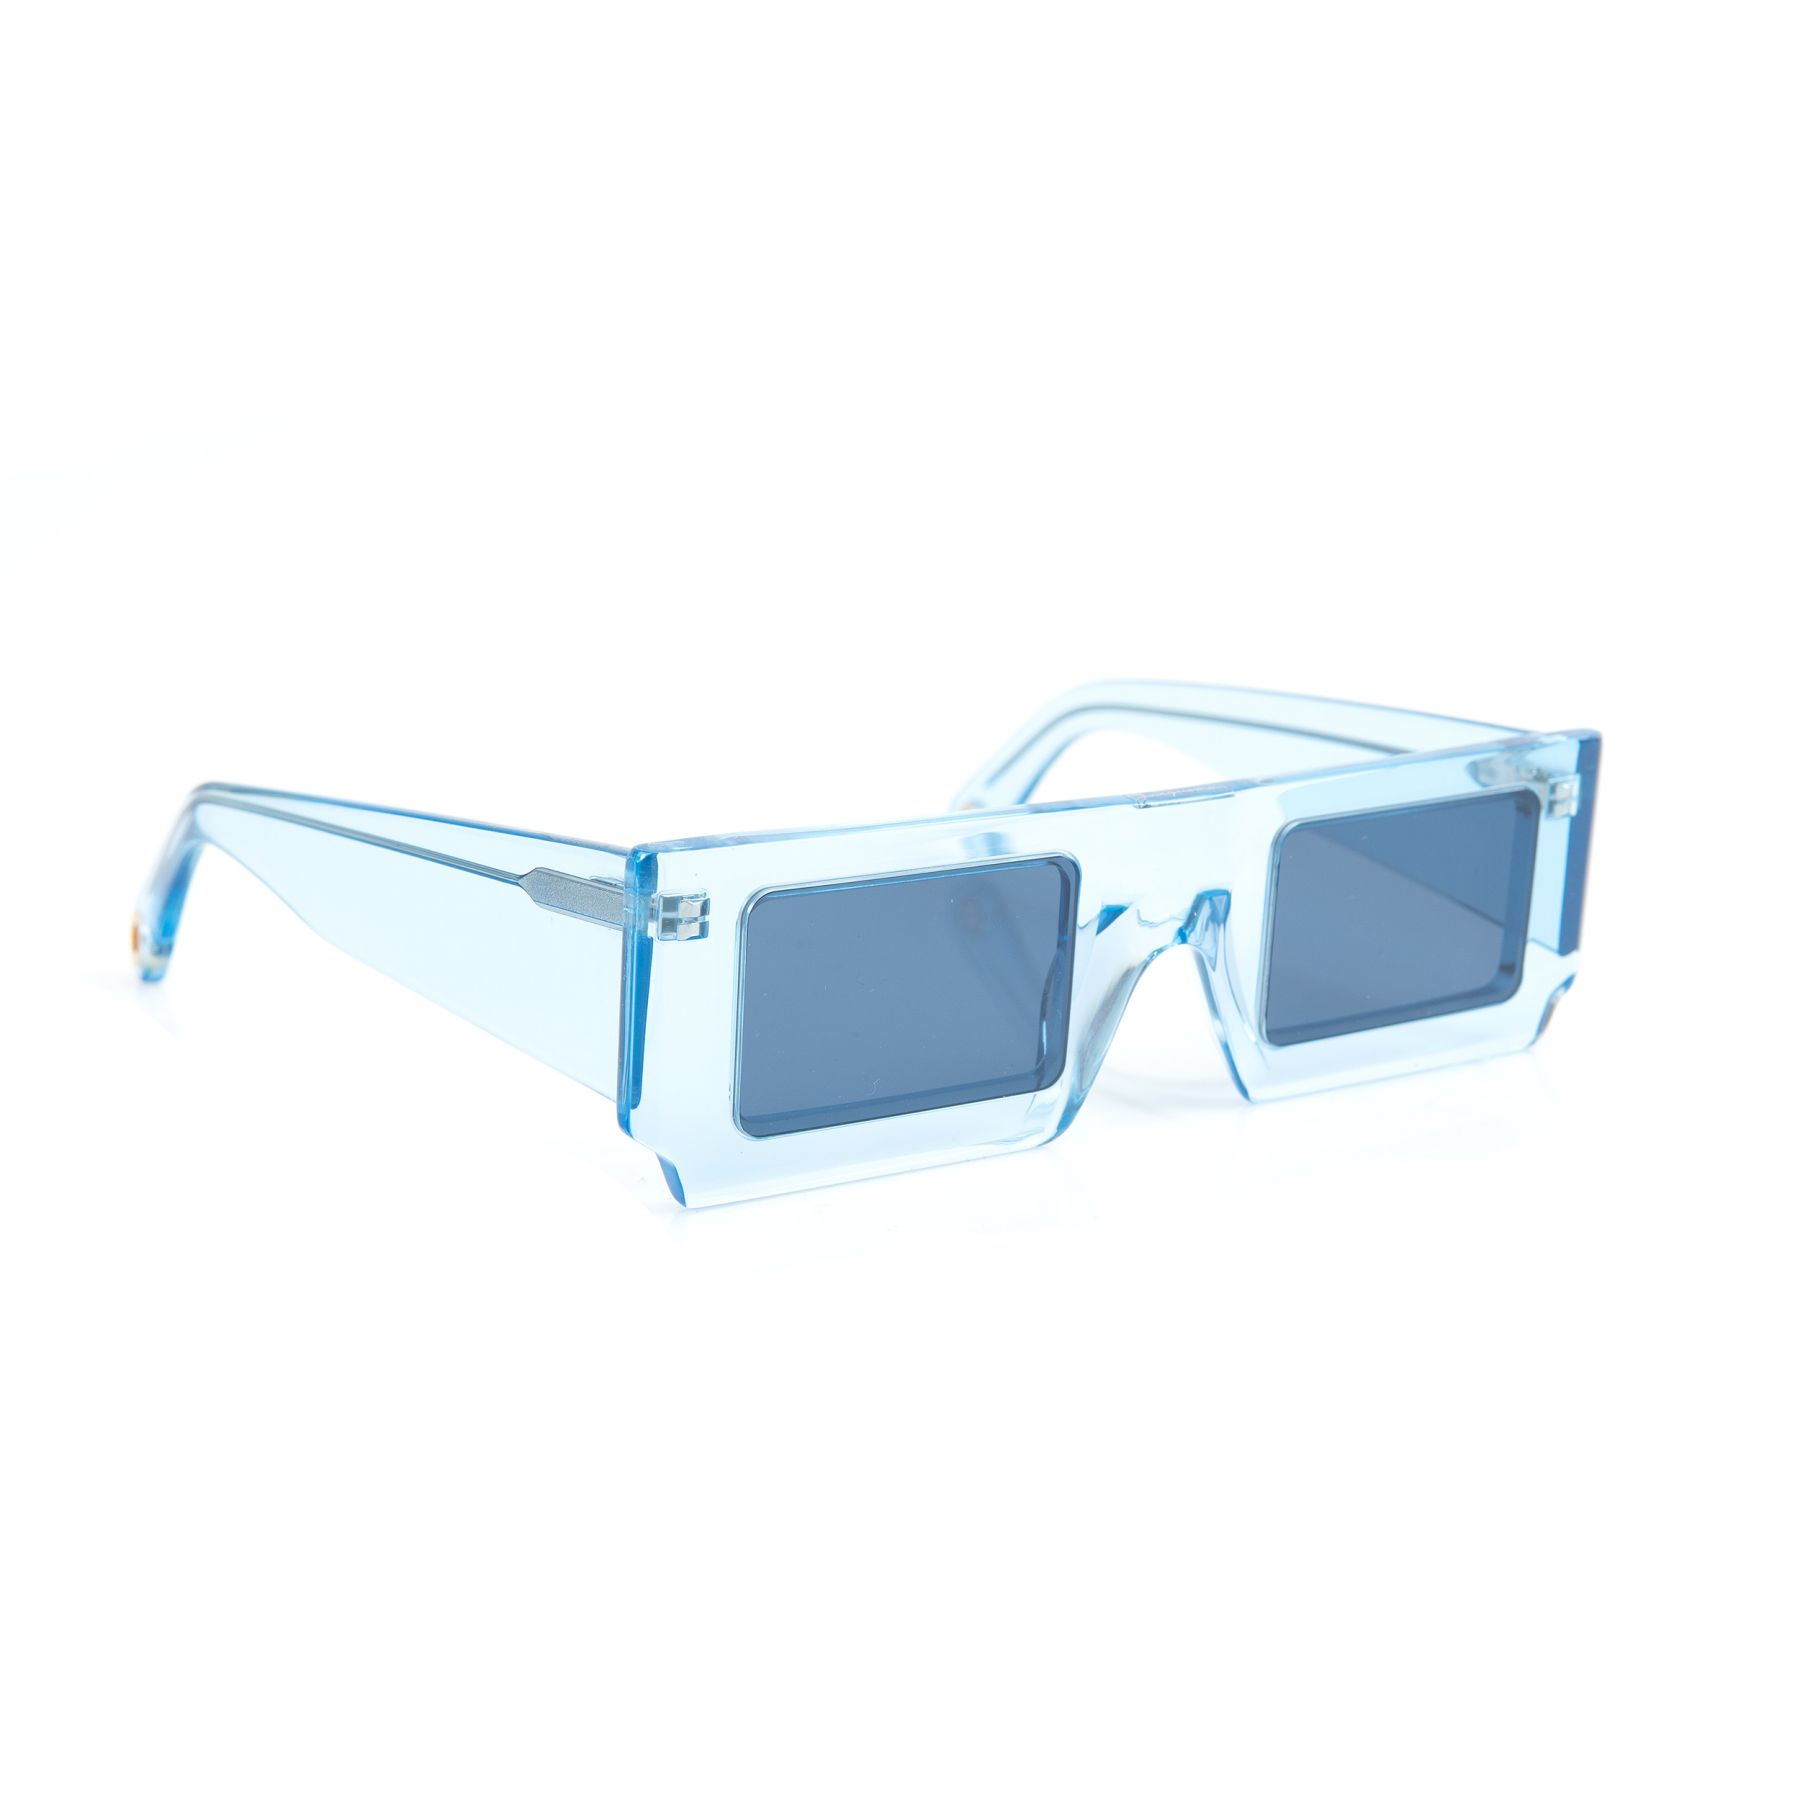 Очки Jacquemus Les lunettes Solei голубые